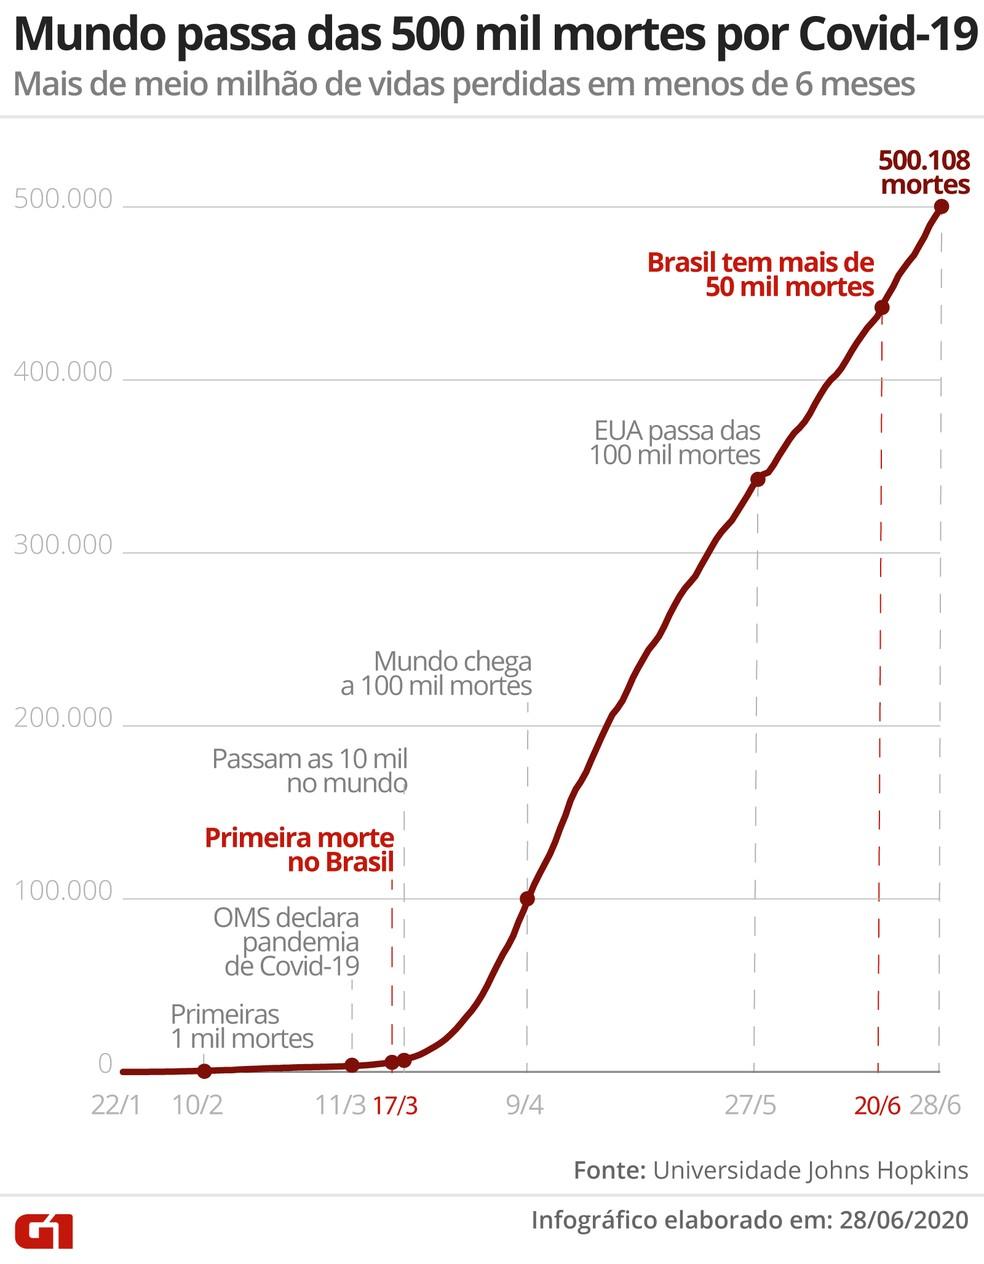 Mundo passa das 500 mil mortes por Covid-19 — Foto: G1